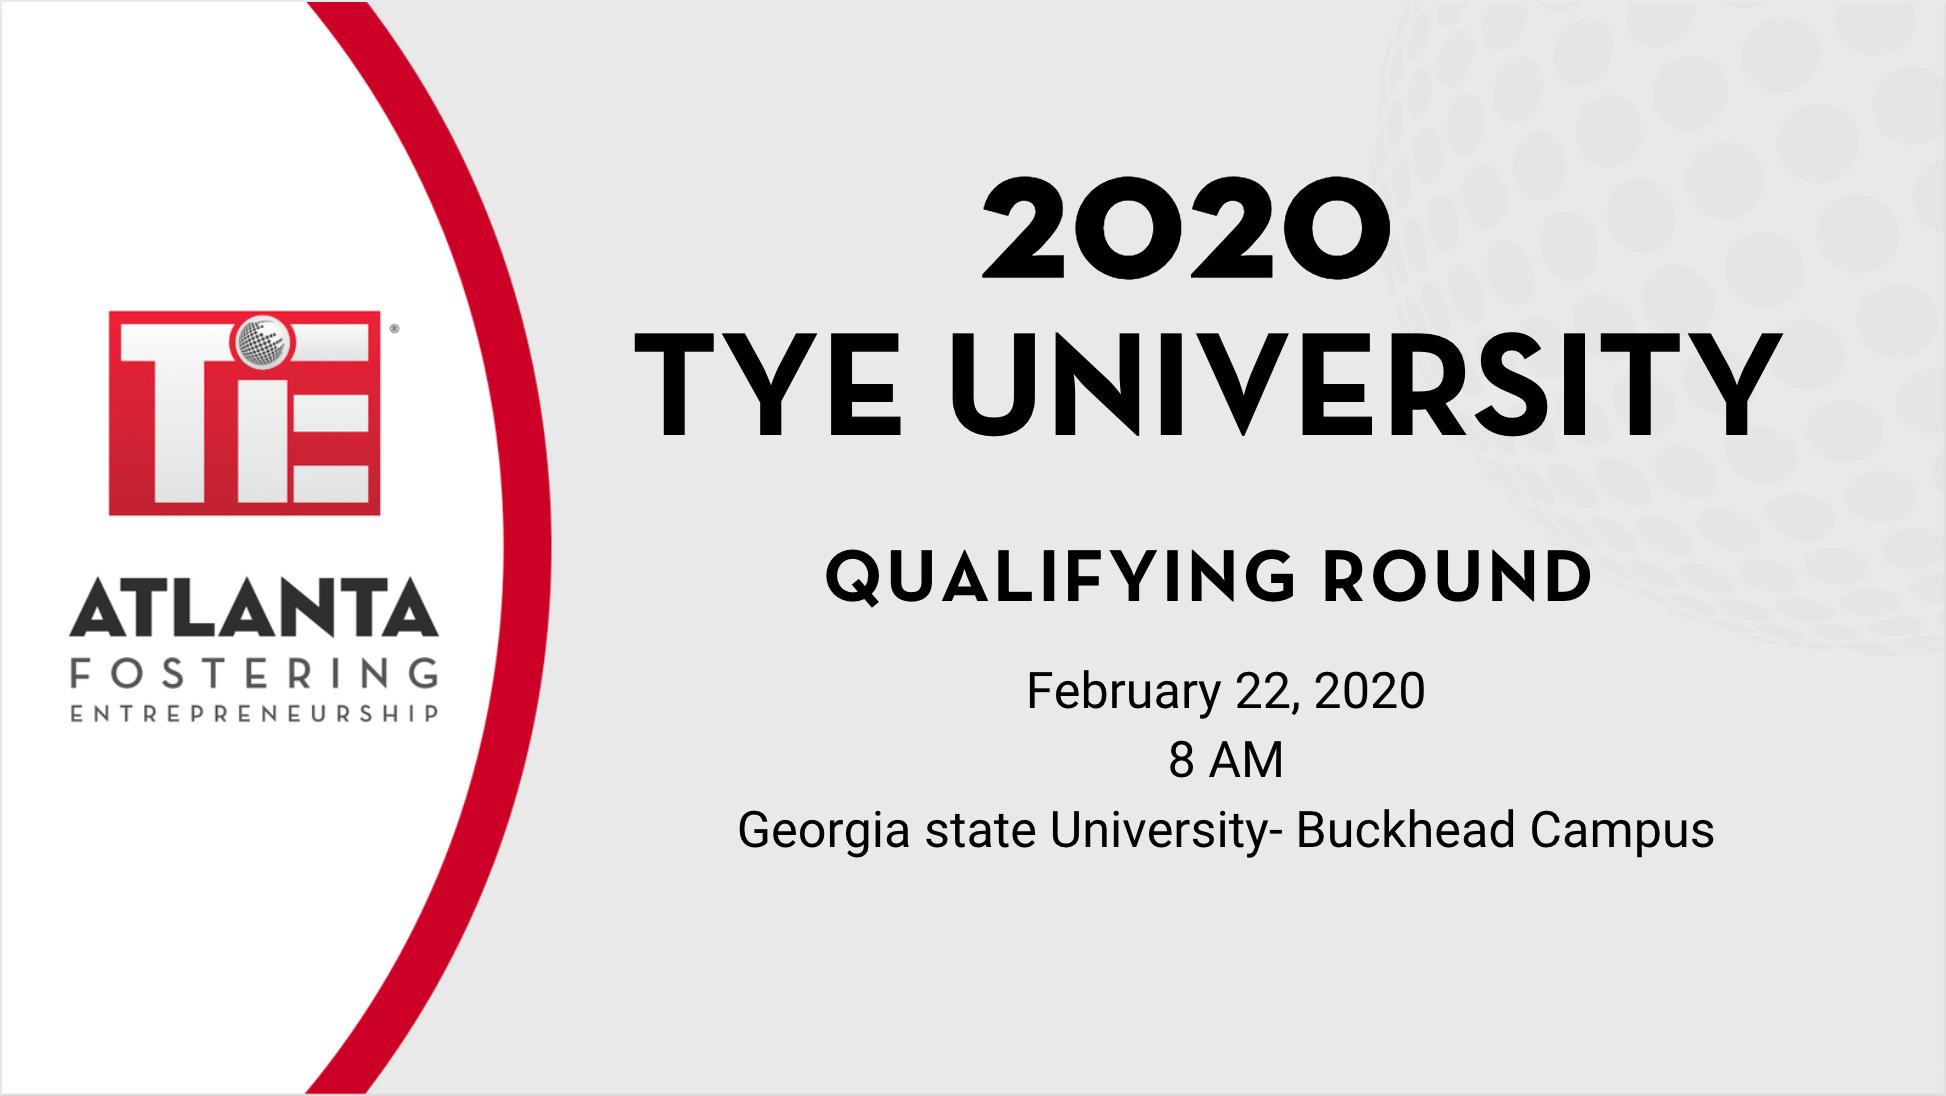 Book Tye University Qualifying Round 2020 Tickets, Atlanta | Tie Pertaining To Georgia State University Holiday Schedule 2020